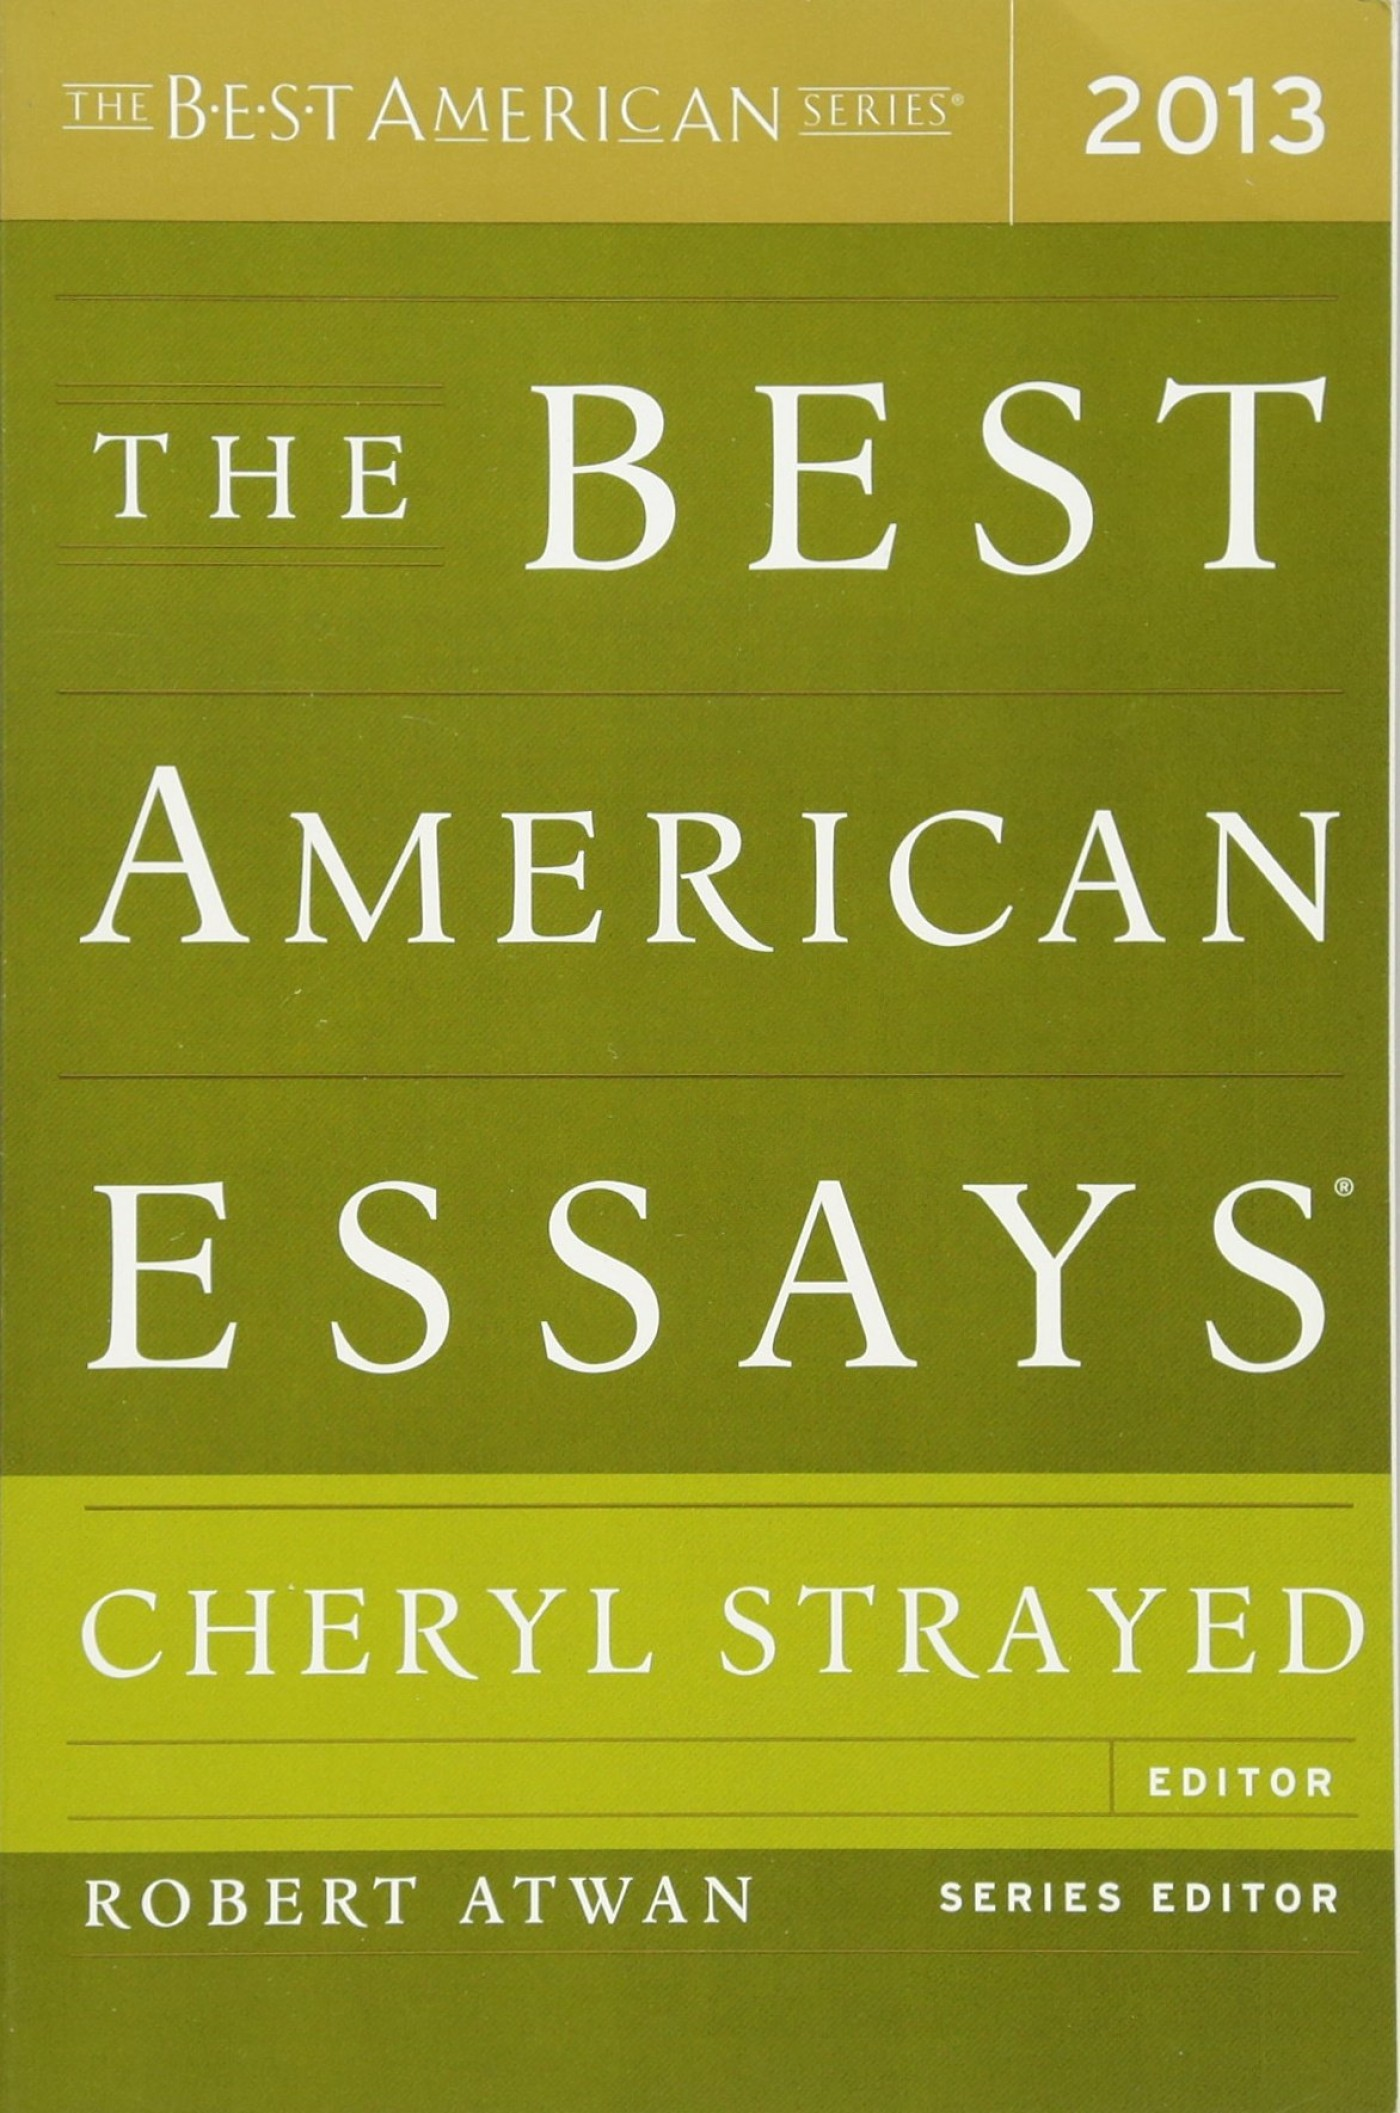 003 The Best American Essays 81nkls2j9vl Essay Wonderful 2013 Pdf Download Of Century Sparknotes 2017 1400